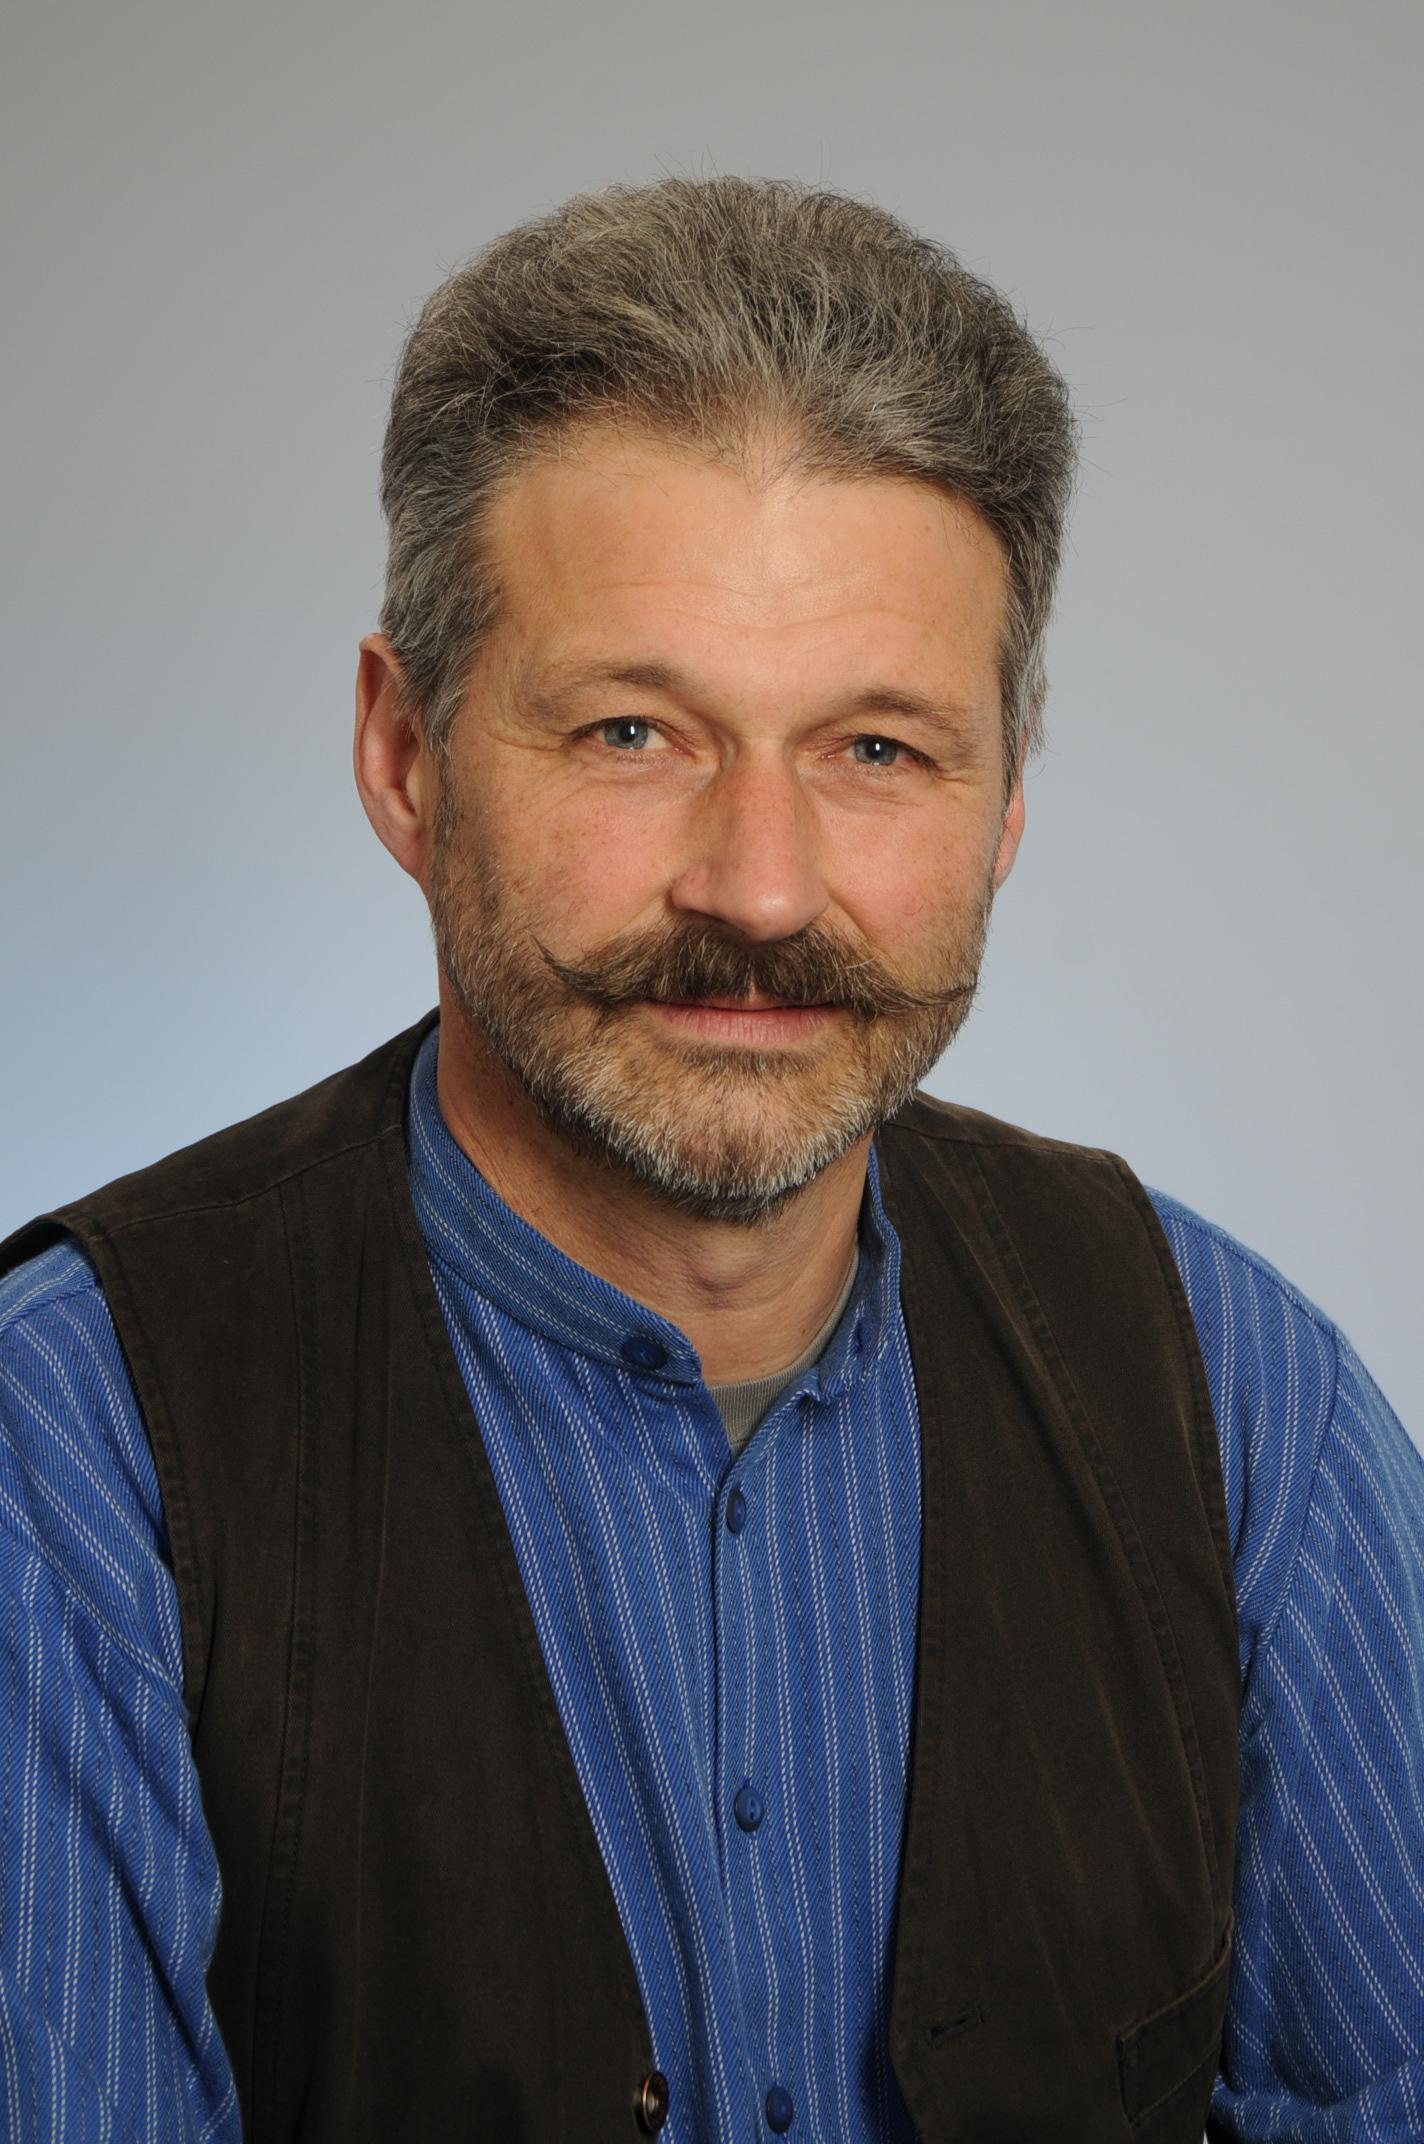 Bernhard Schmähl